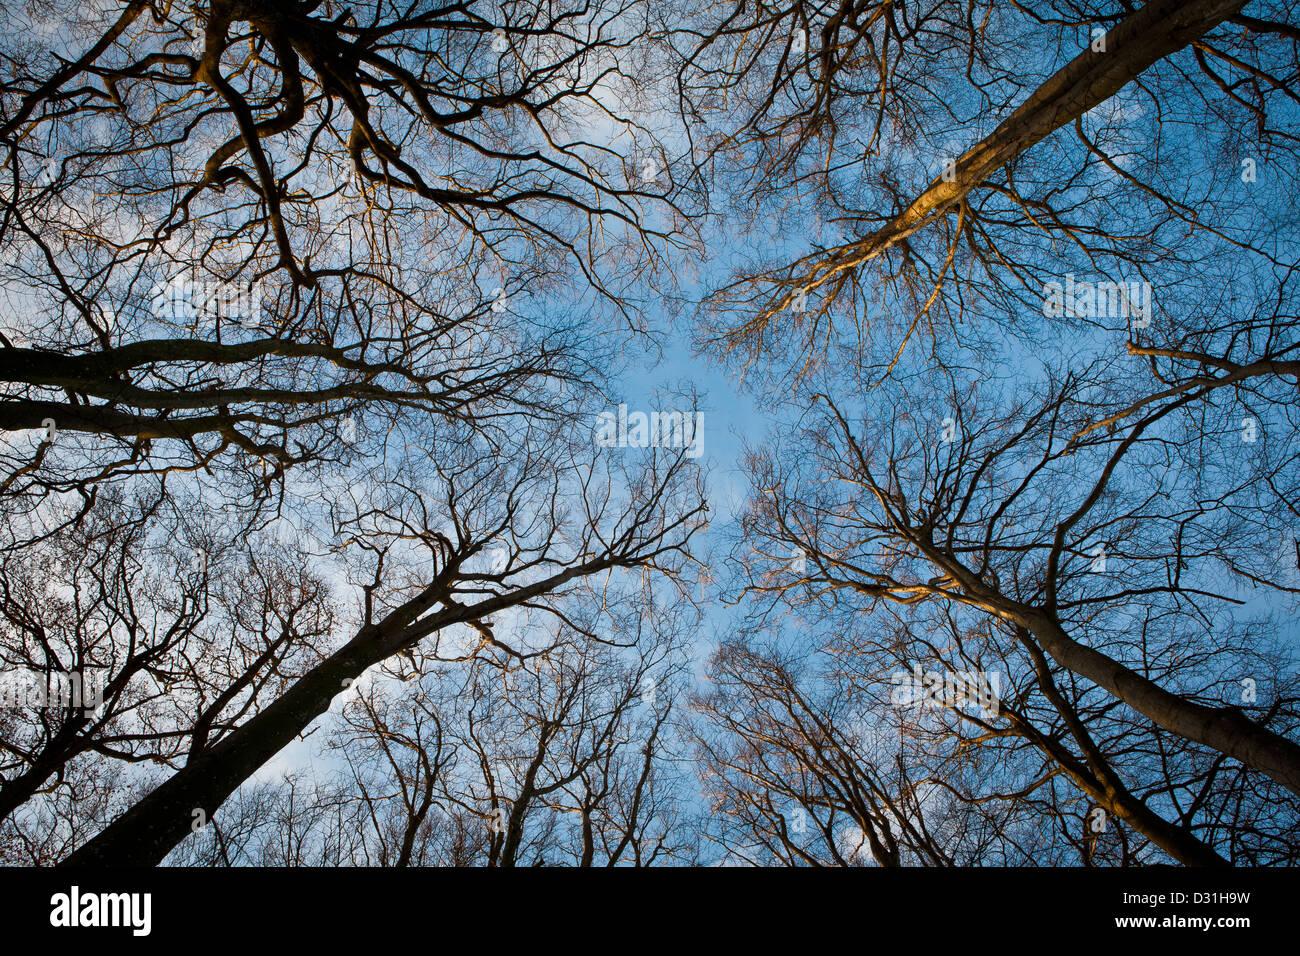 Beech trees in Telemarkslunden, Rygge kommune, Østfold fylke, Norway. - Stock Image